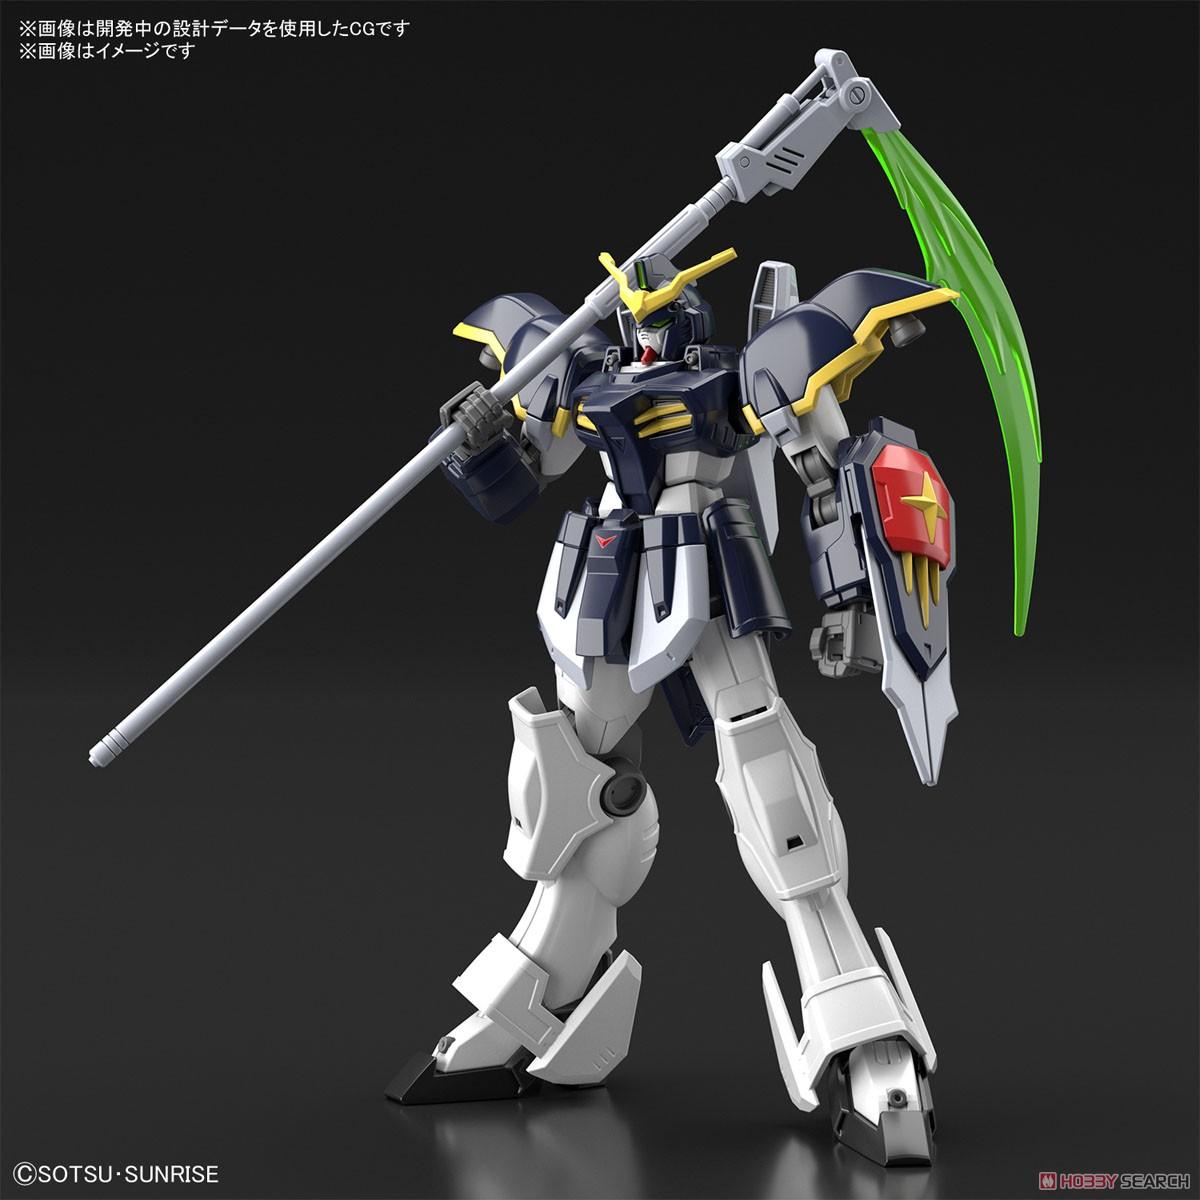 HGAC 1/144『ガンダムデスサイズ』新機動戦記ガンダムW プラモデル-001